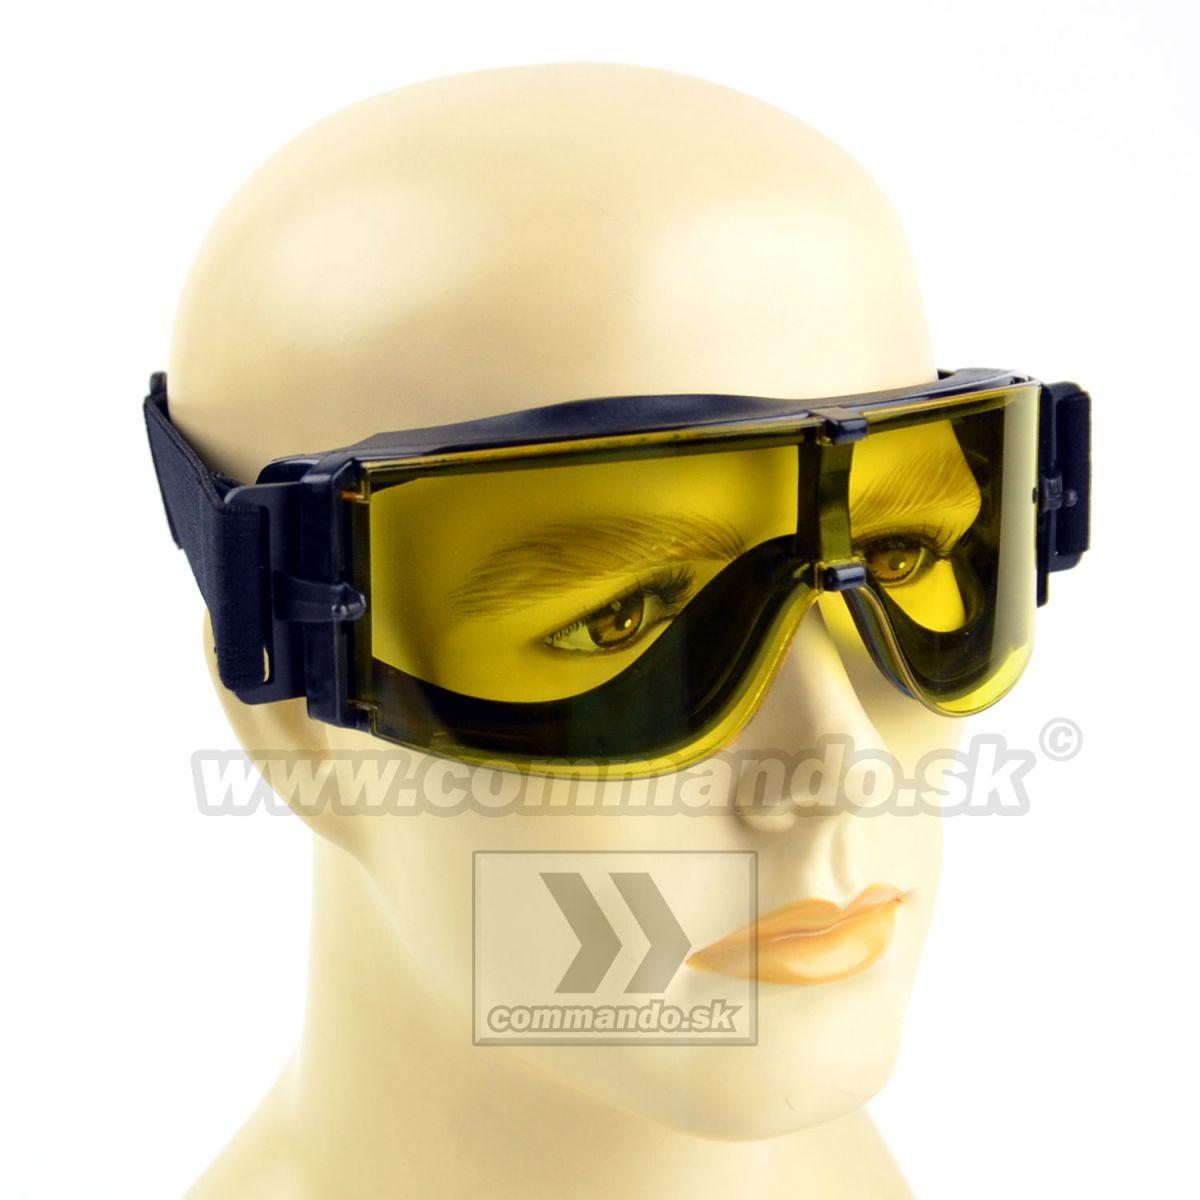 aed3538c1 Taktické okuliare X800 Glasses Yellow žlté | Commando.sk